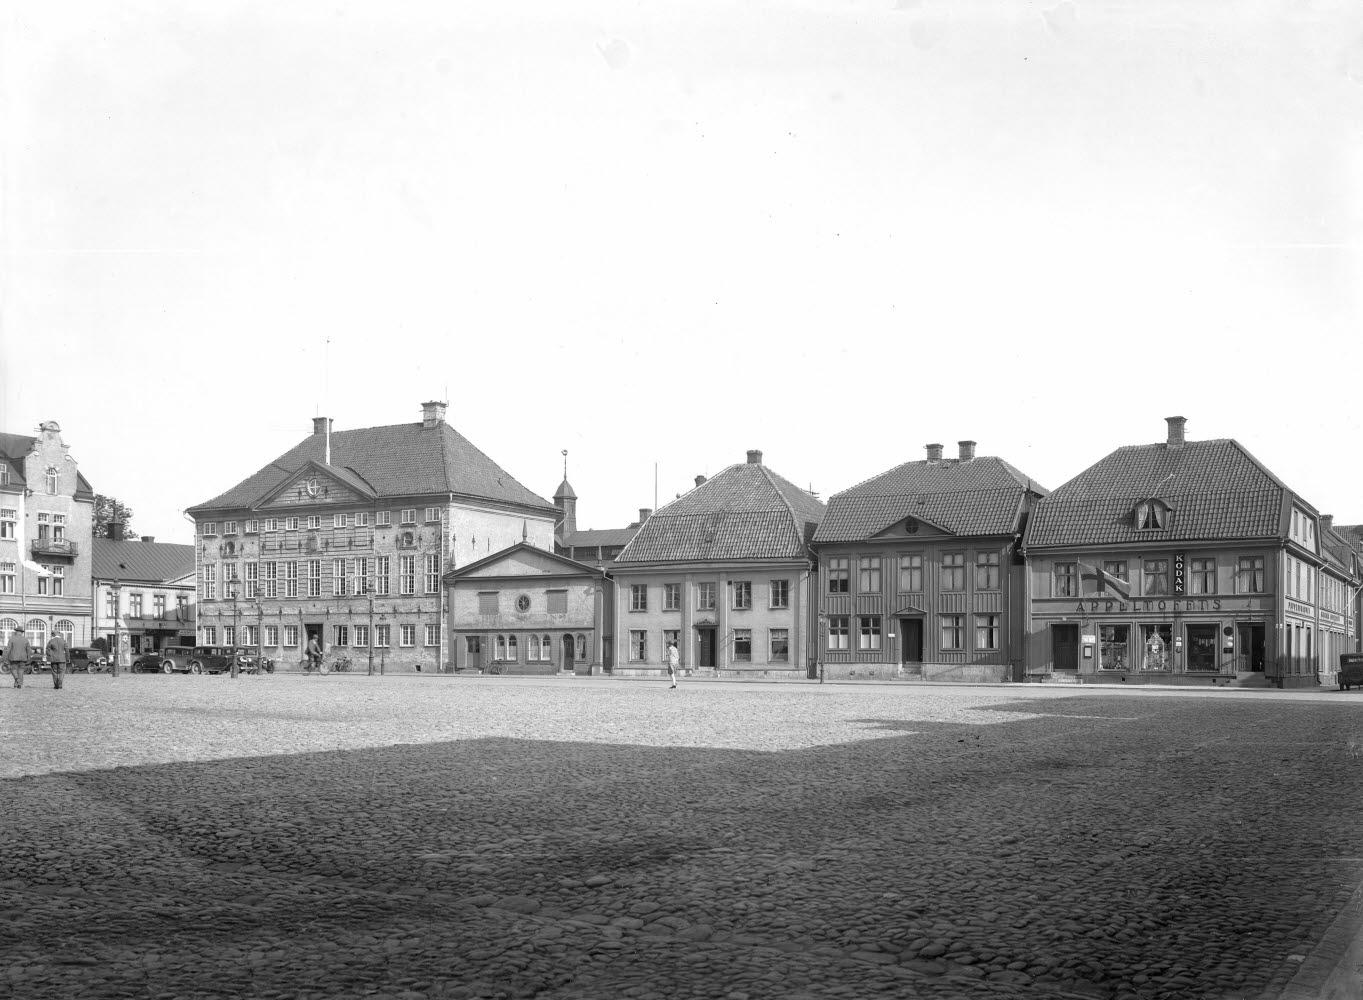 Stortorget södra sidan, Rådhuset